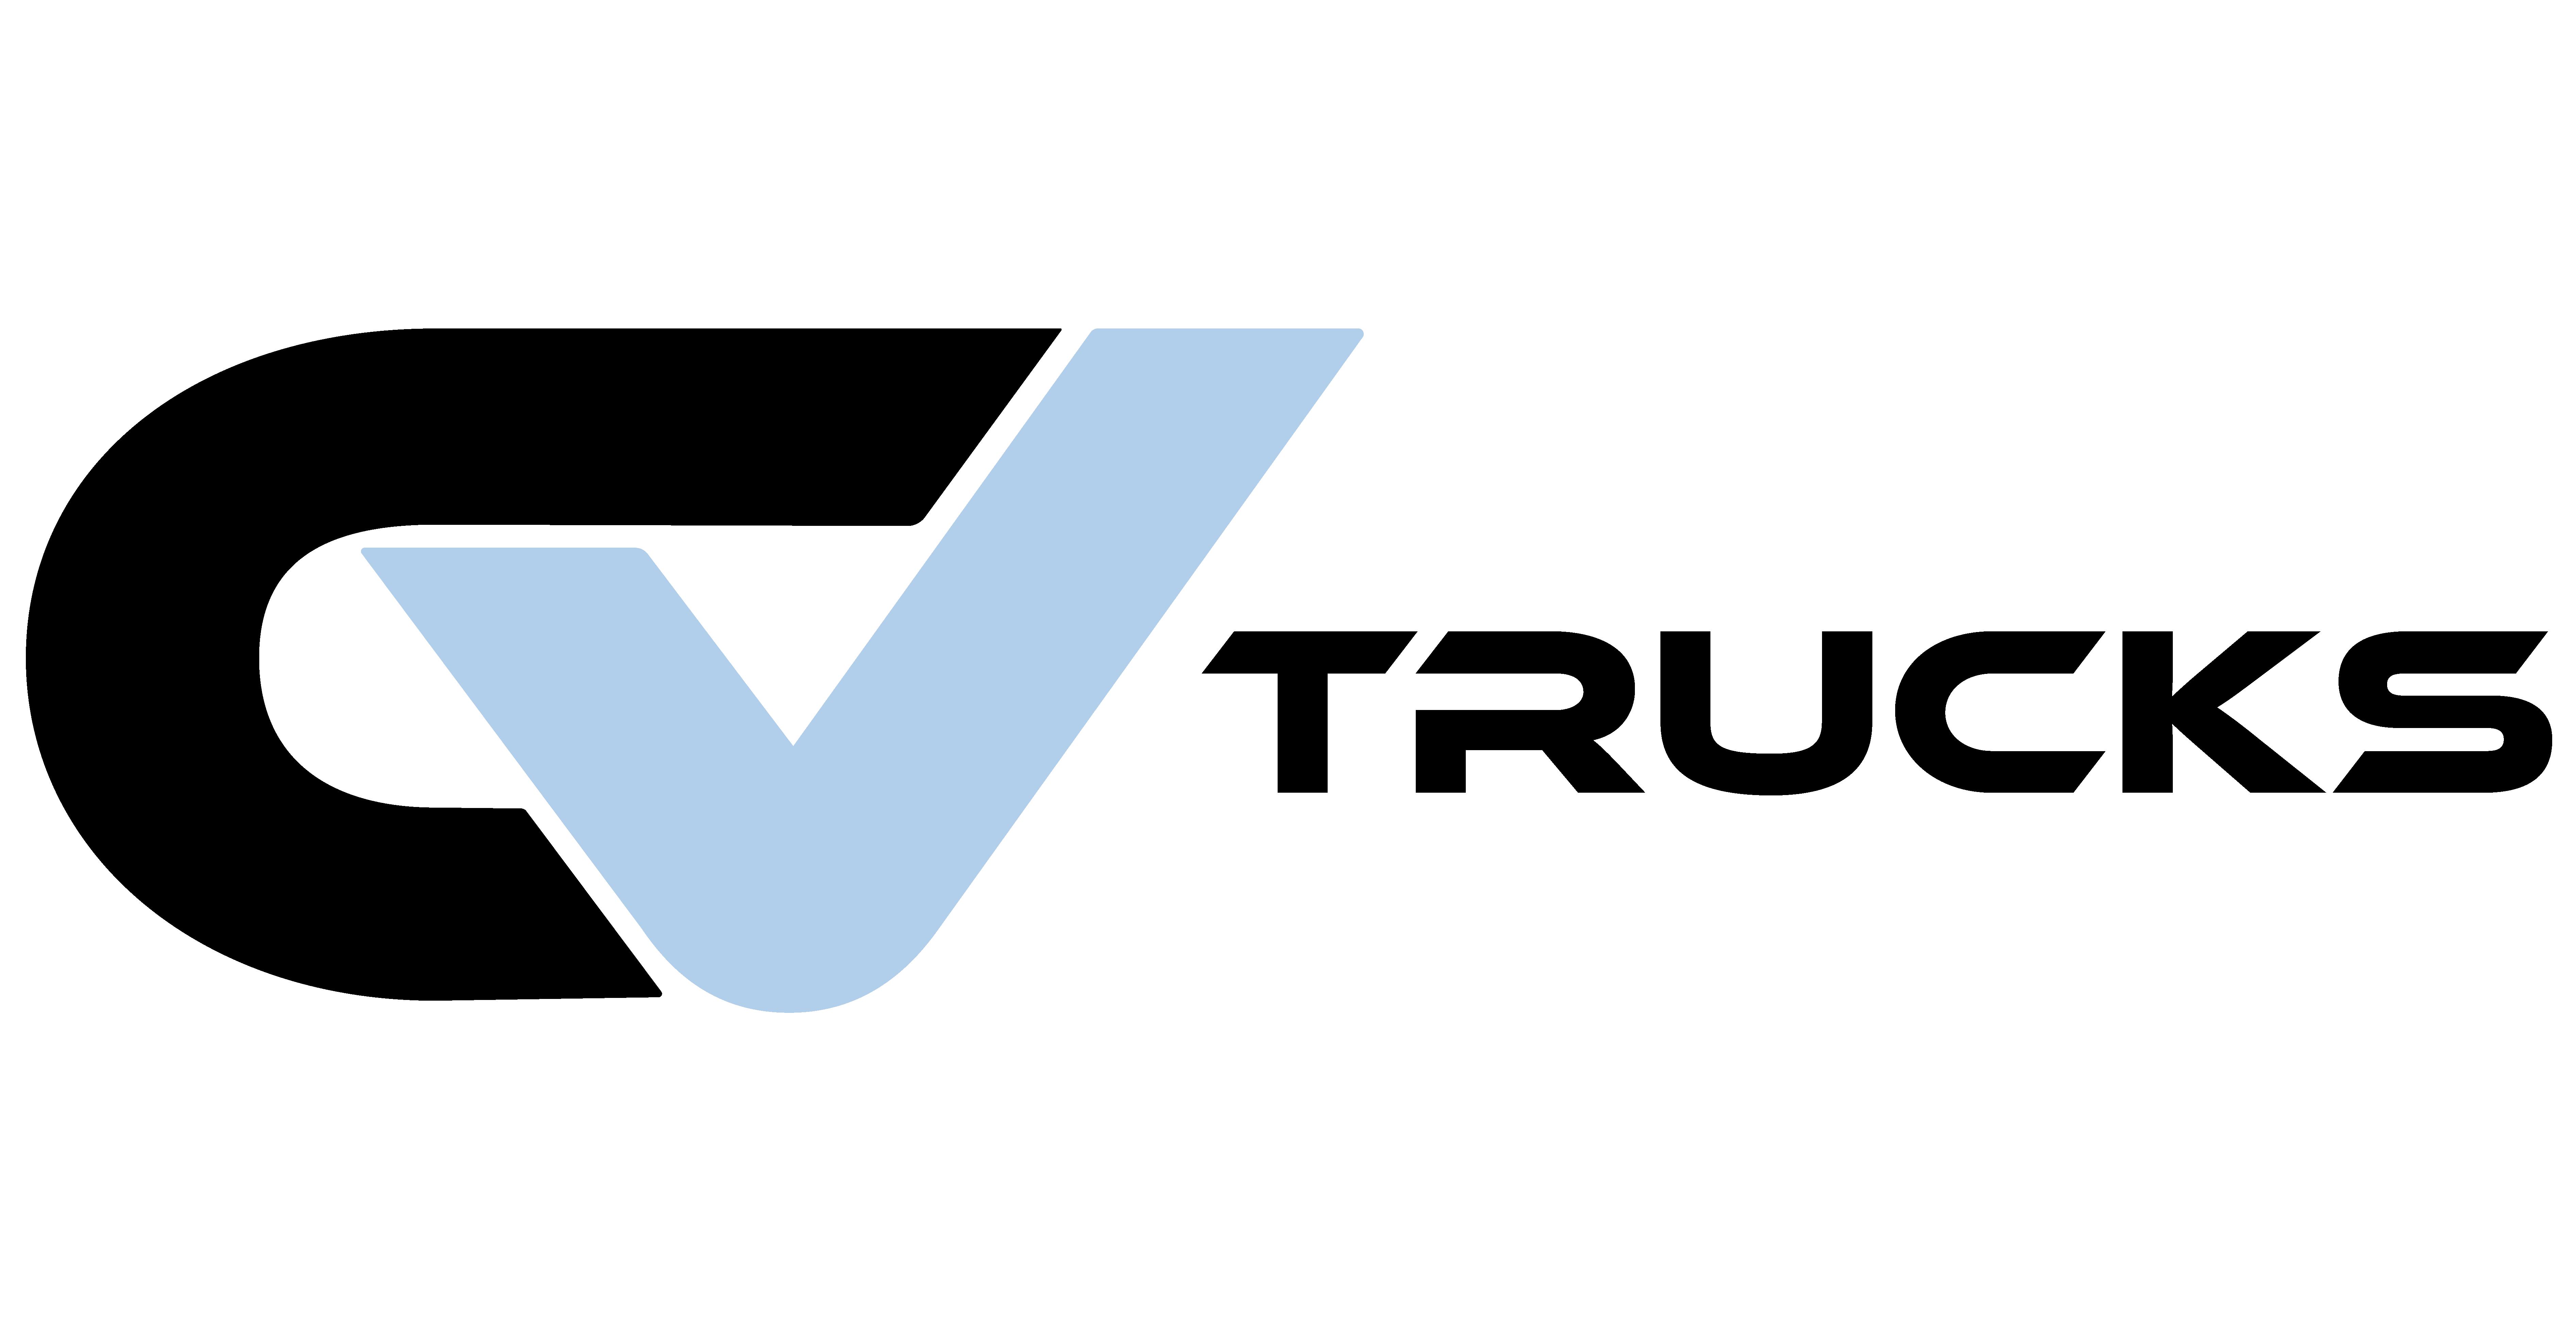 CV Trucks logo Kite Media project